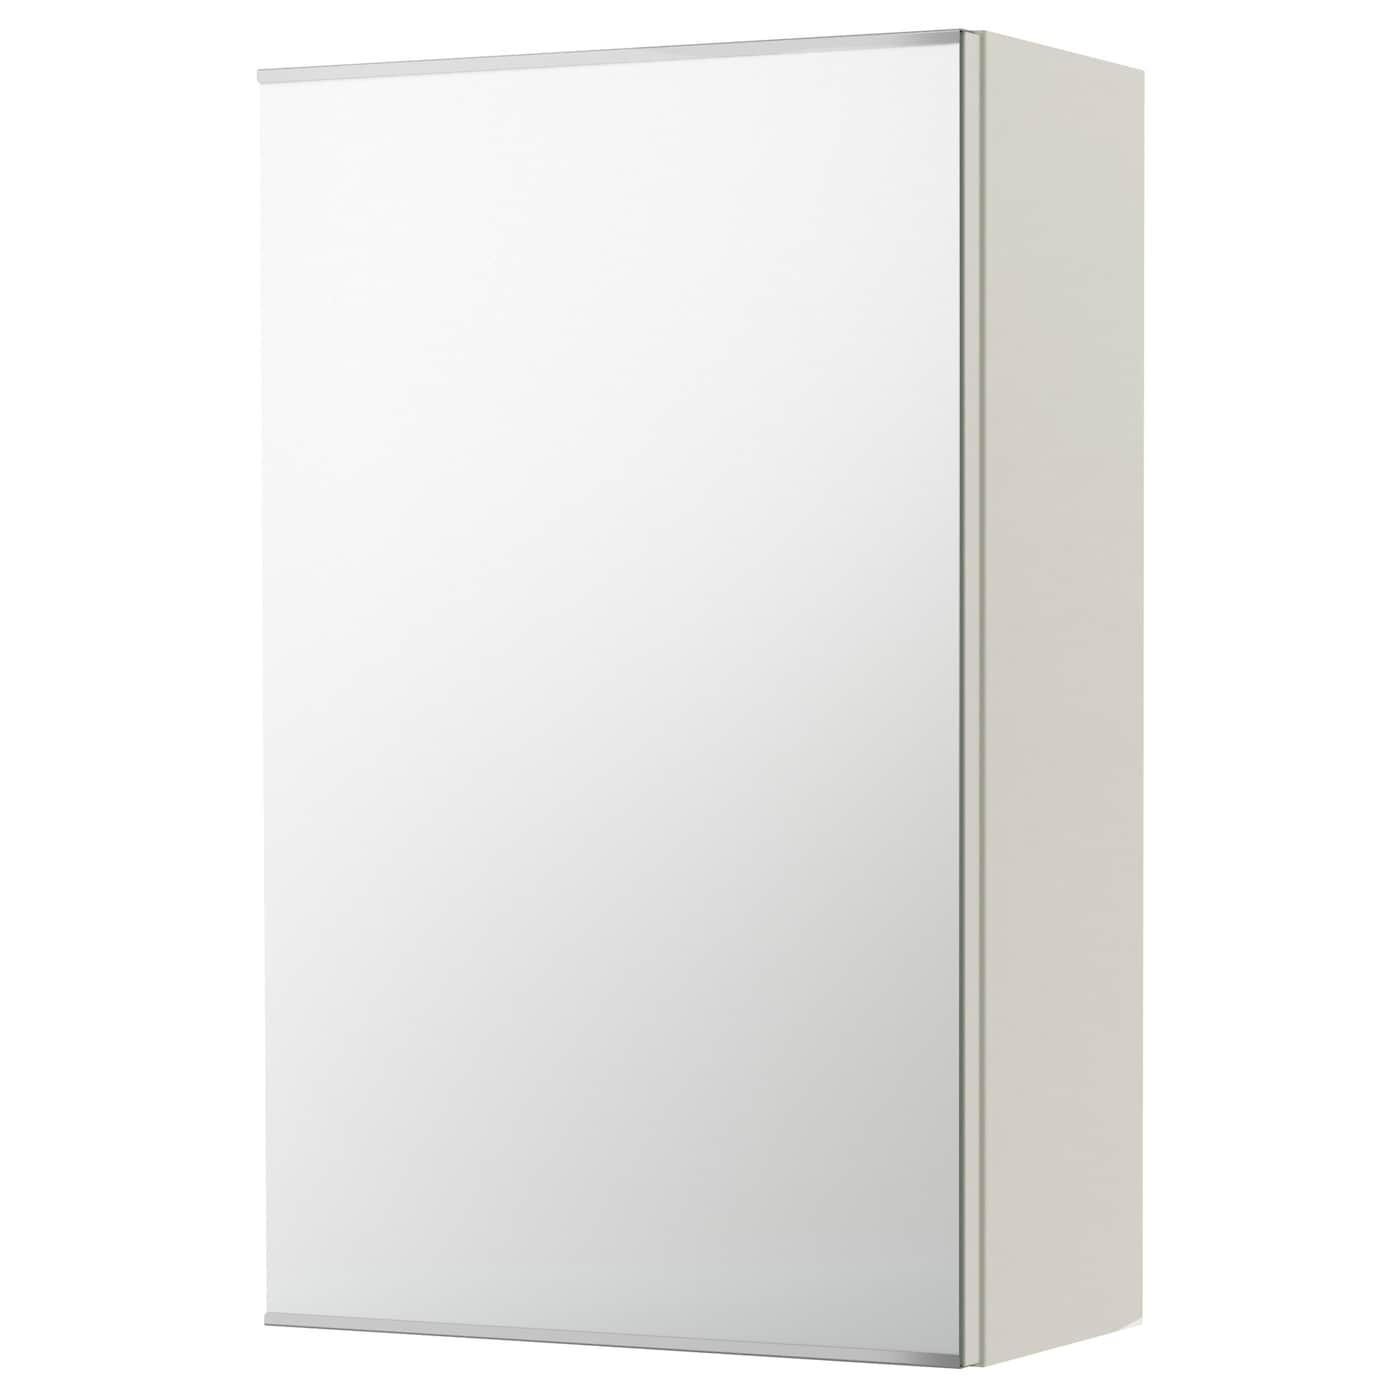 LILLÅNGEN Armario con espejo, 1 puerta Blanco 40 x 21 x 64 cm - IKEA